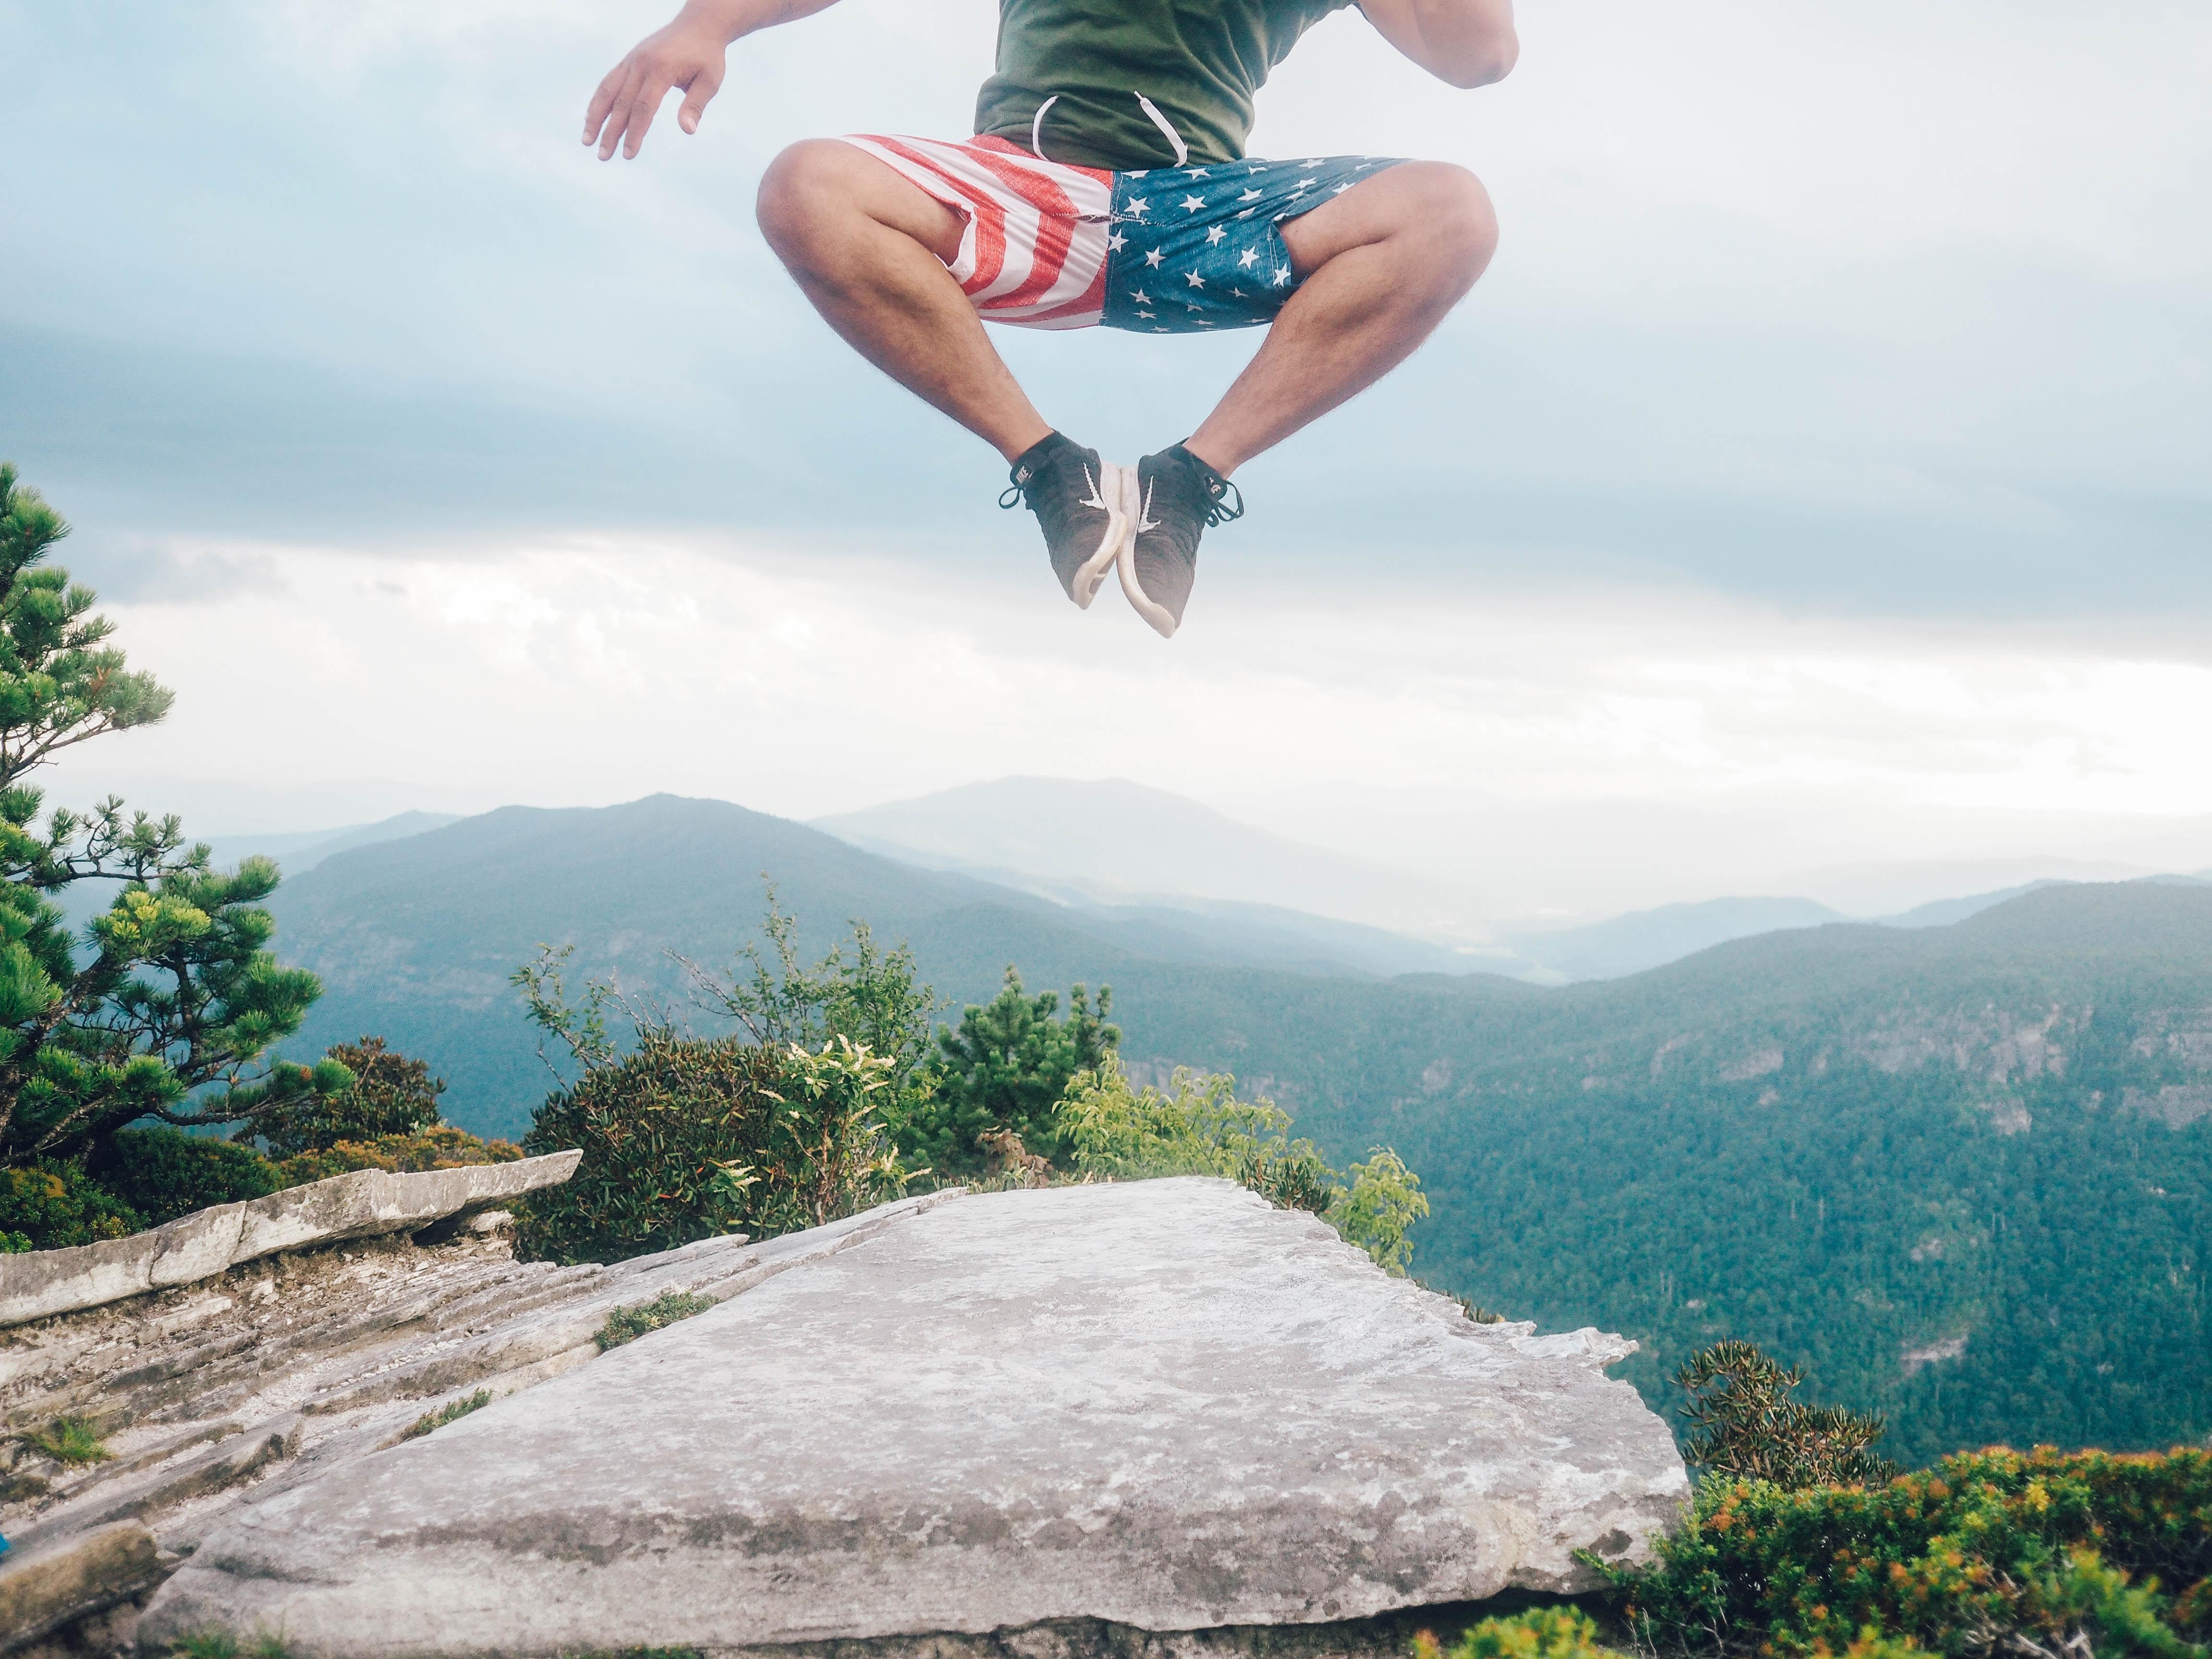 man jumpin in mid air